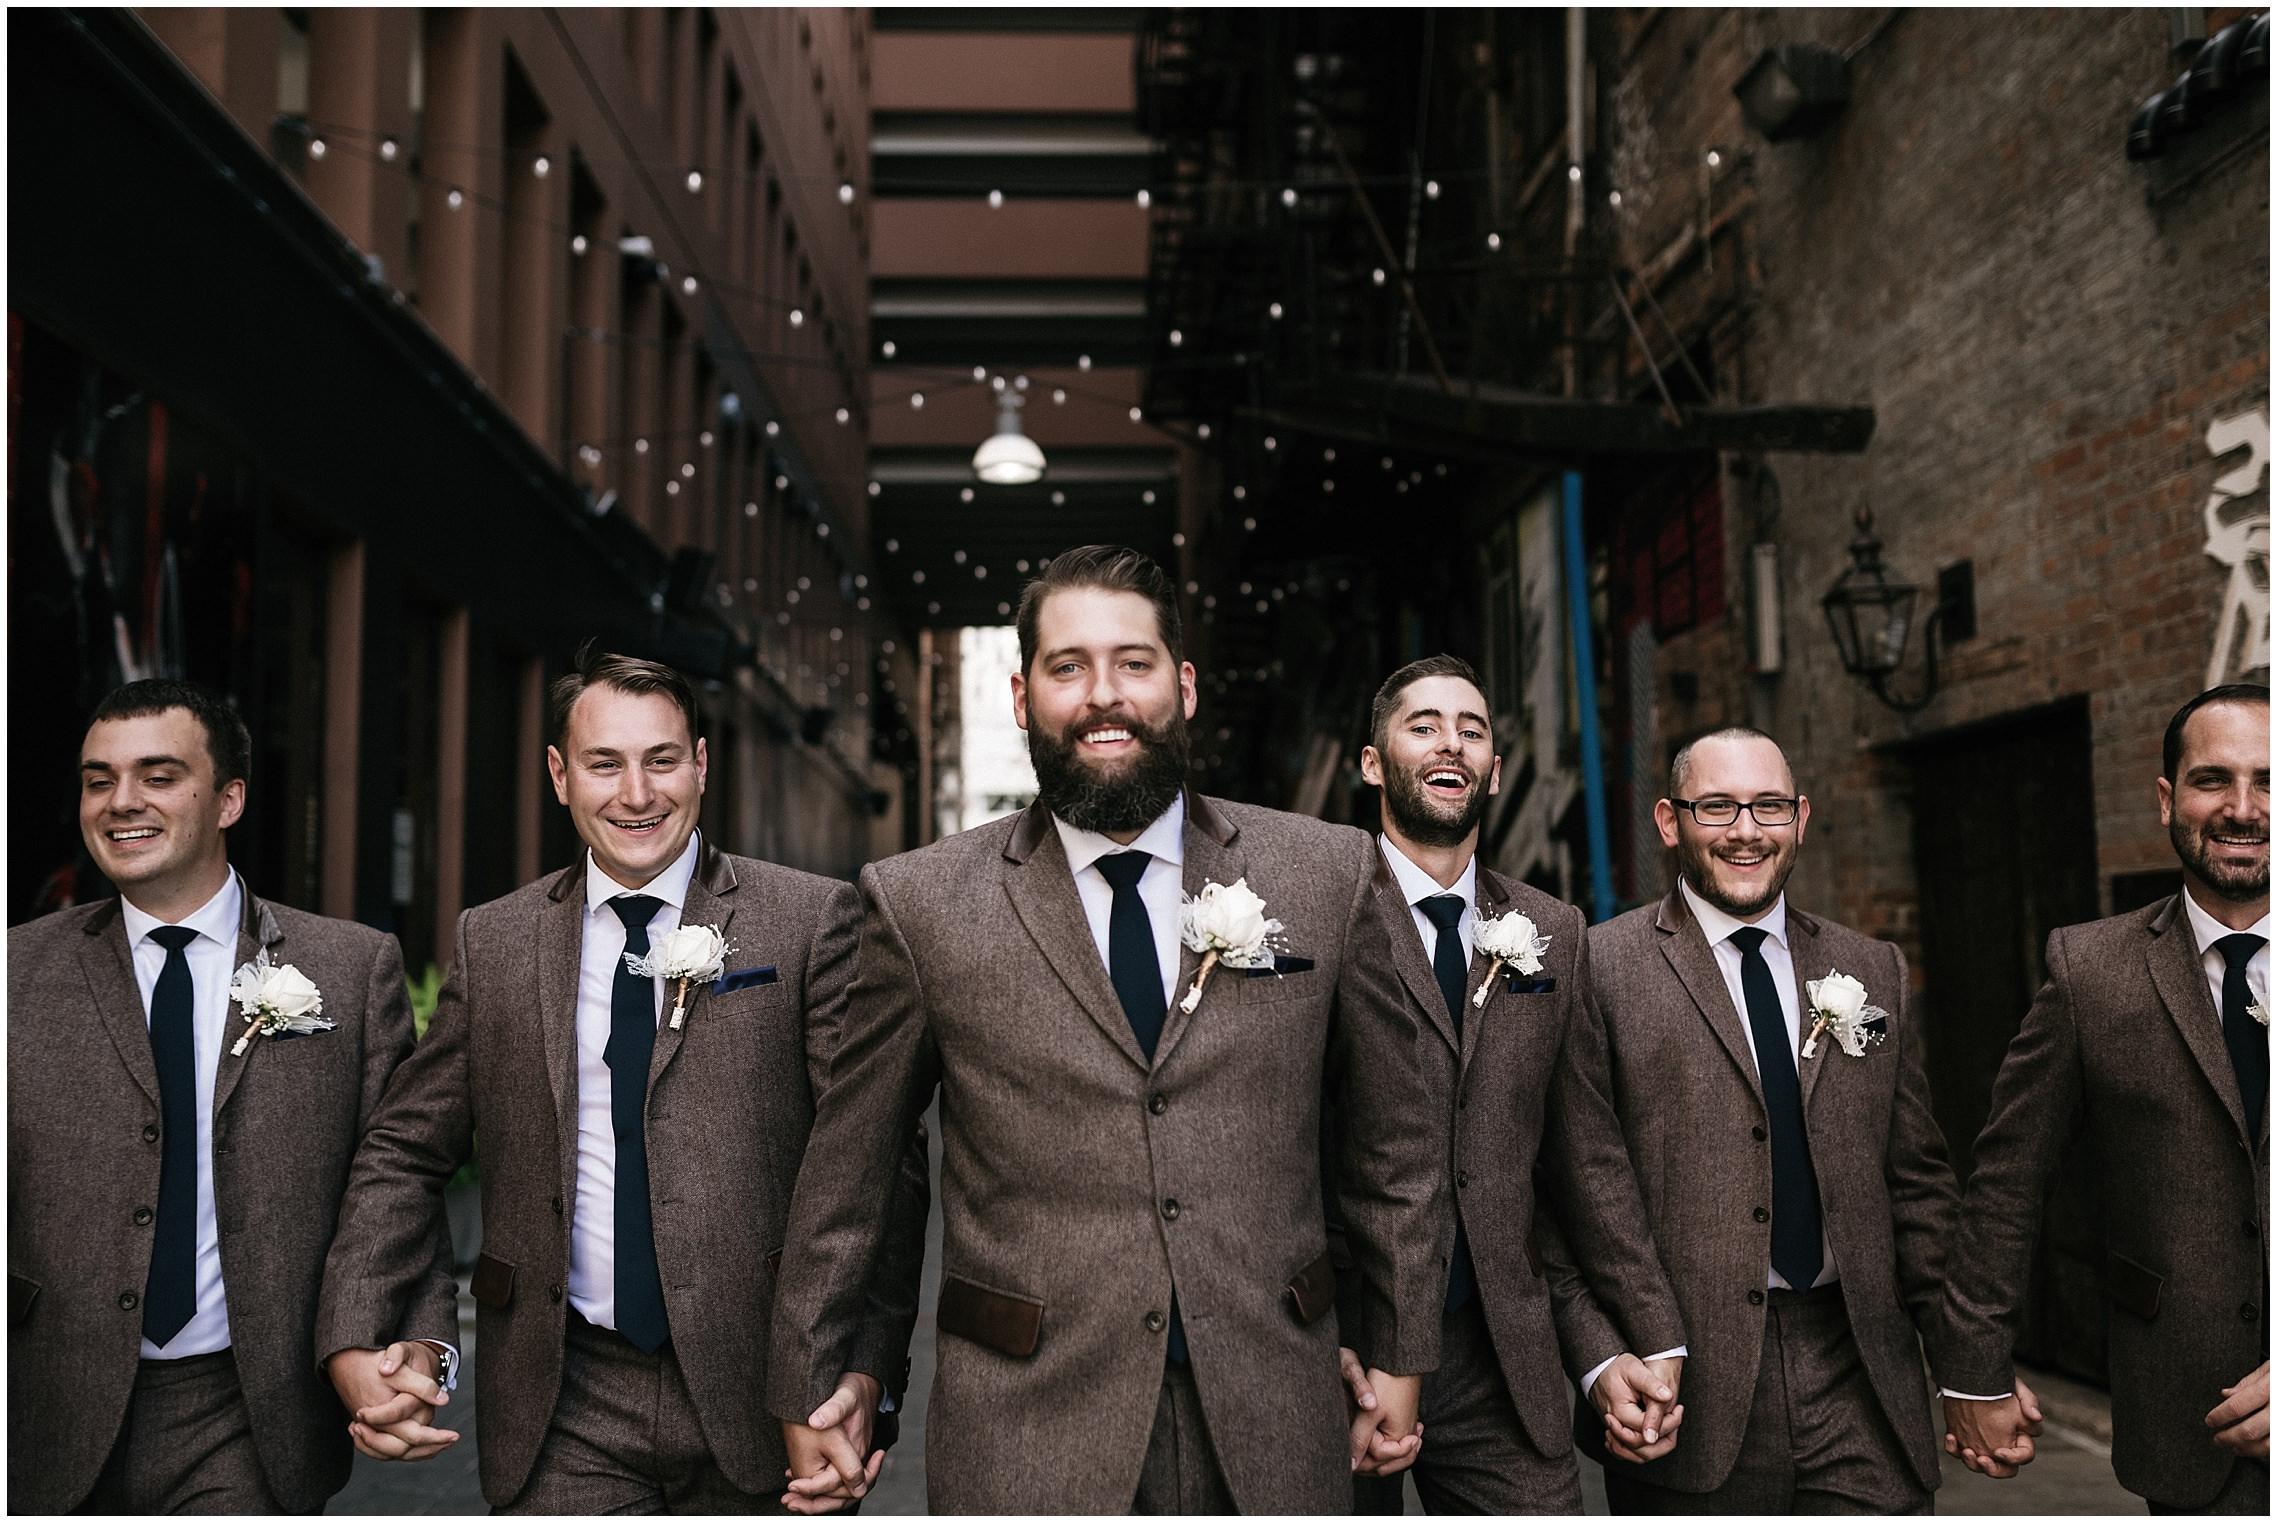 brick_and_mortar_colorado_wedding_photographer_0220.jpg